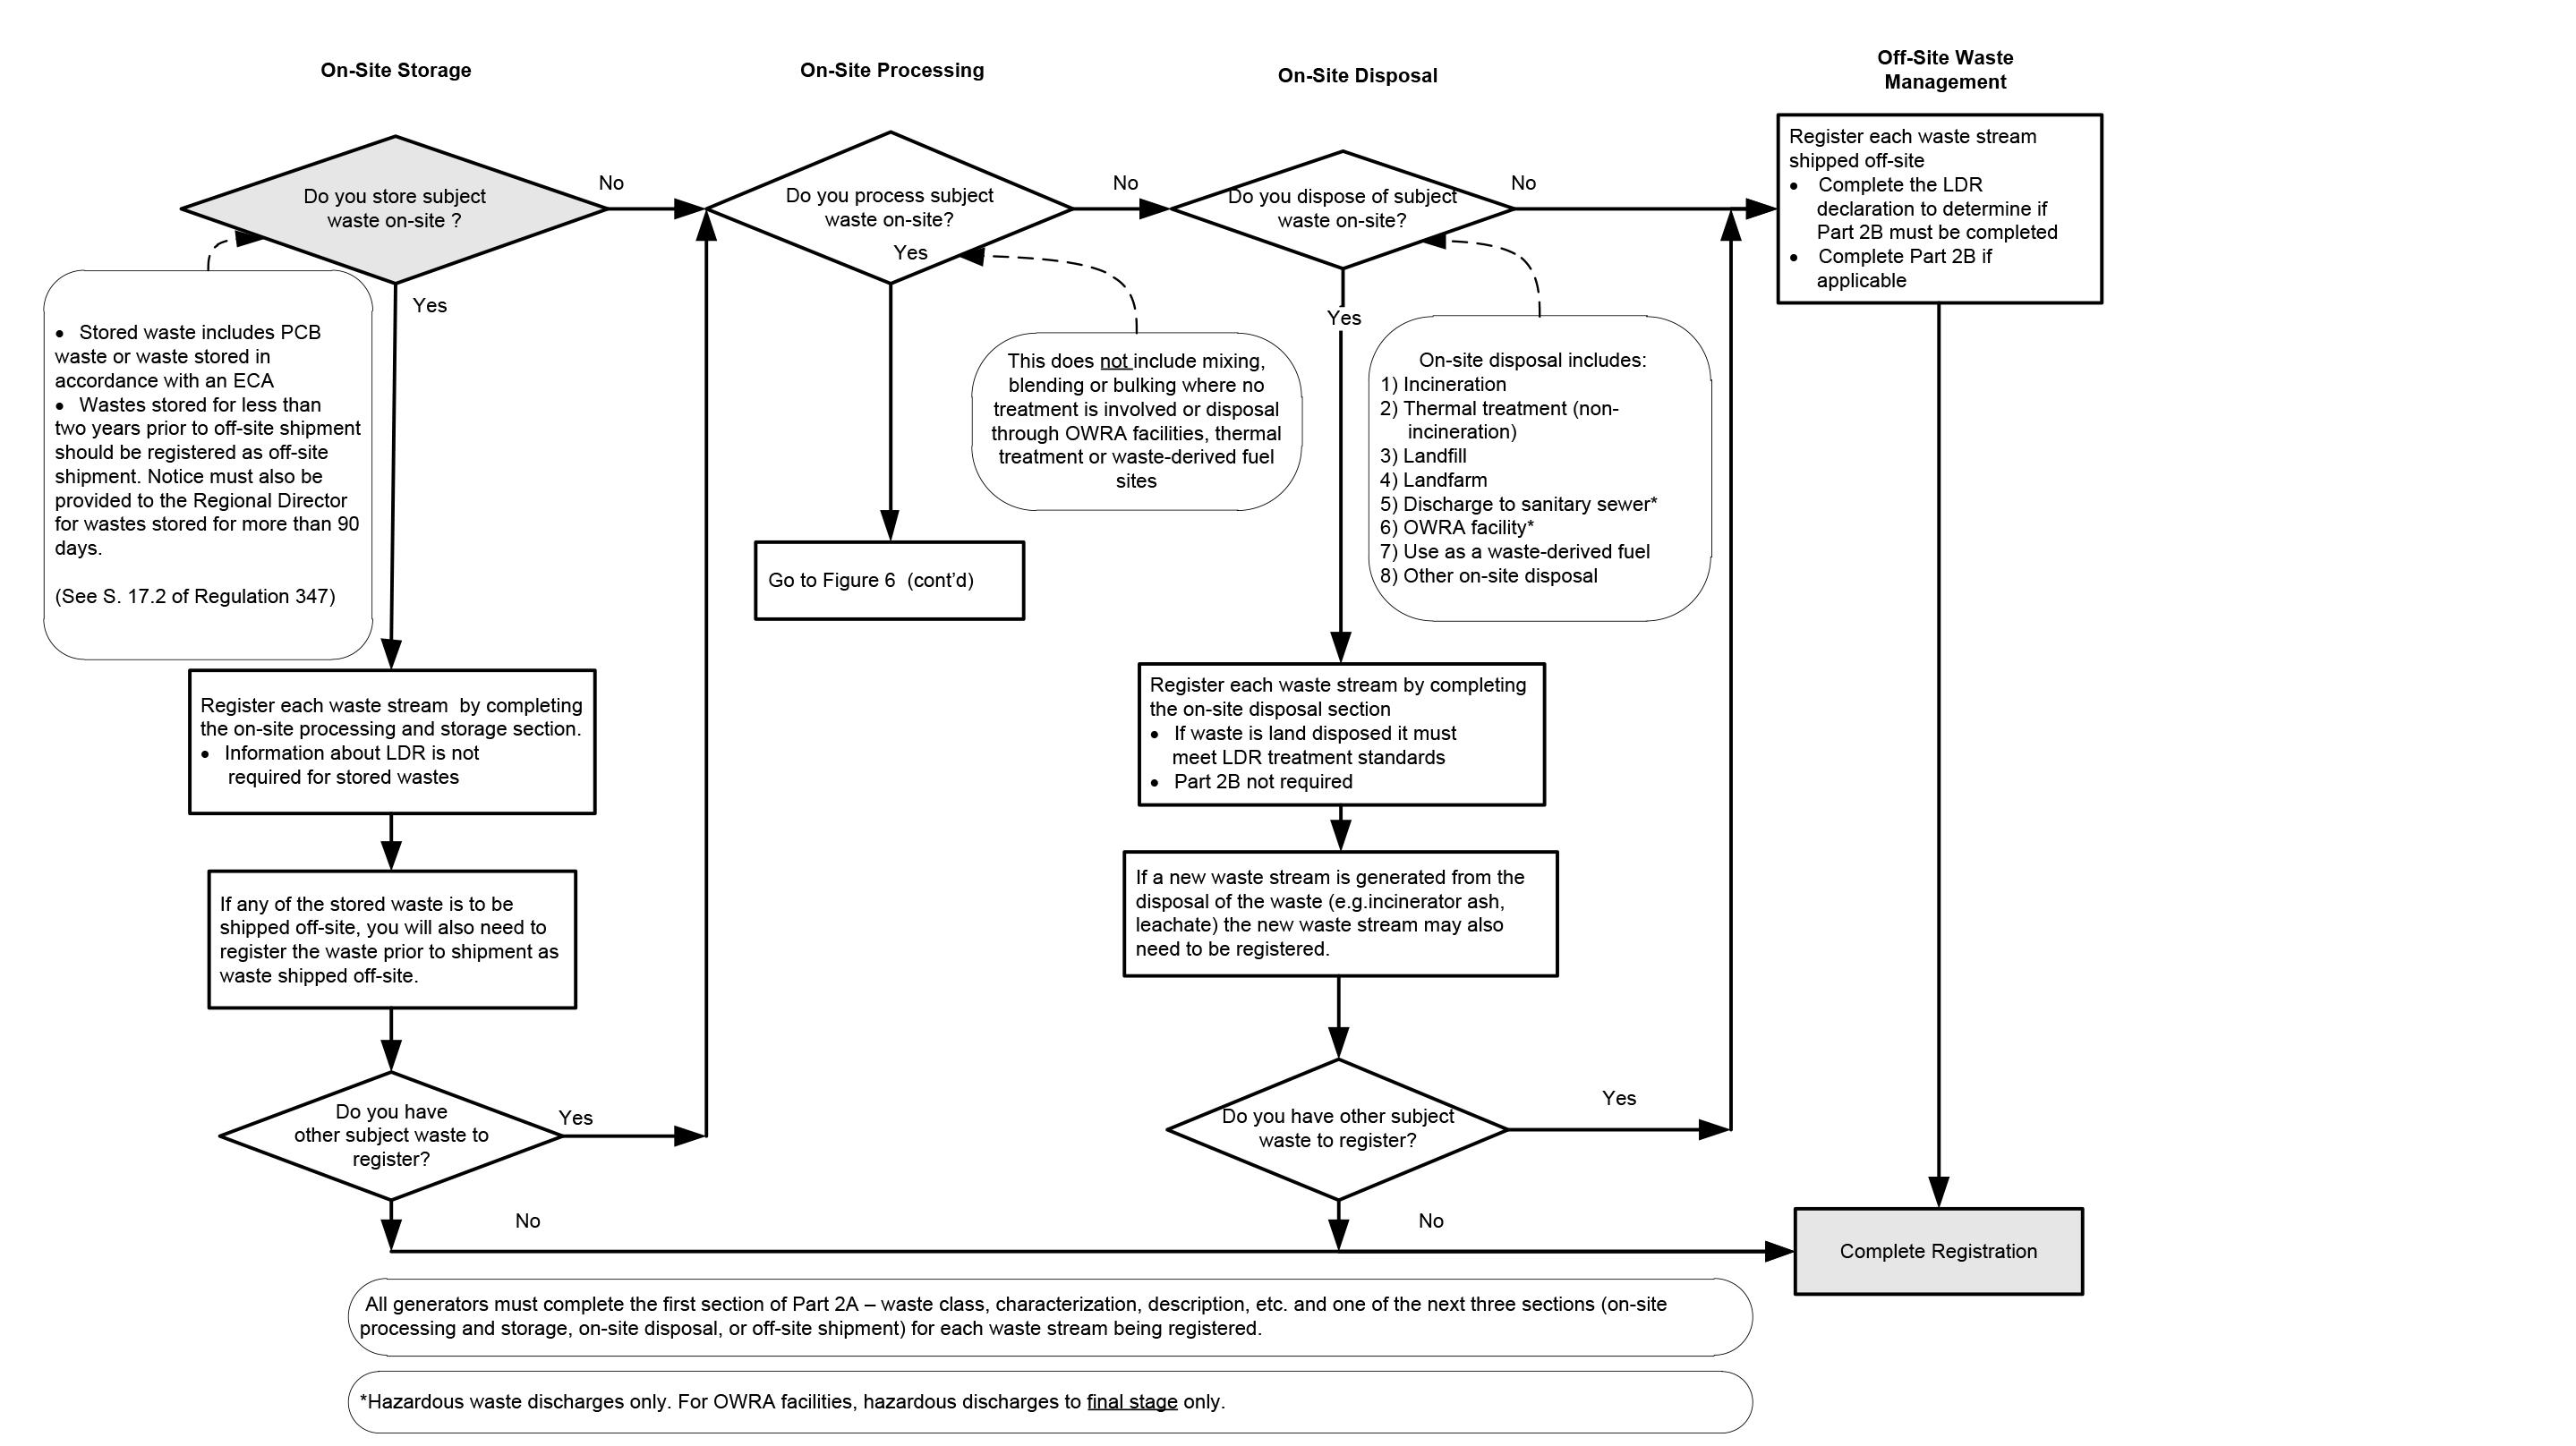 wrg 1299] process flow diagram of all waste streamsdownload figure 6 (jpeg)